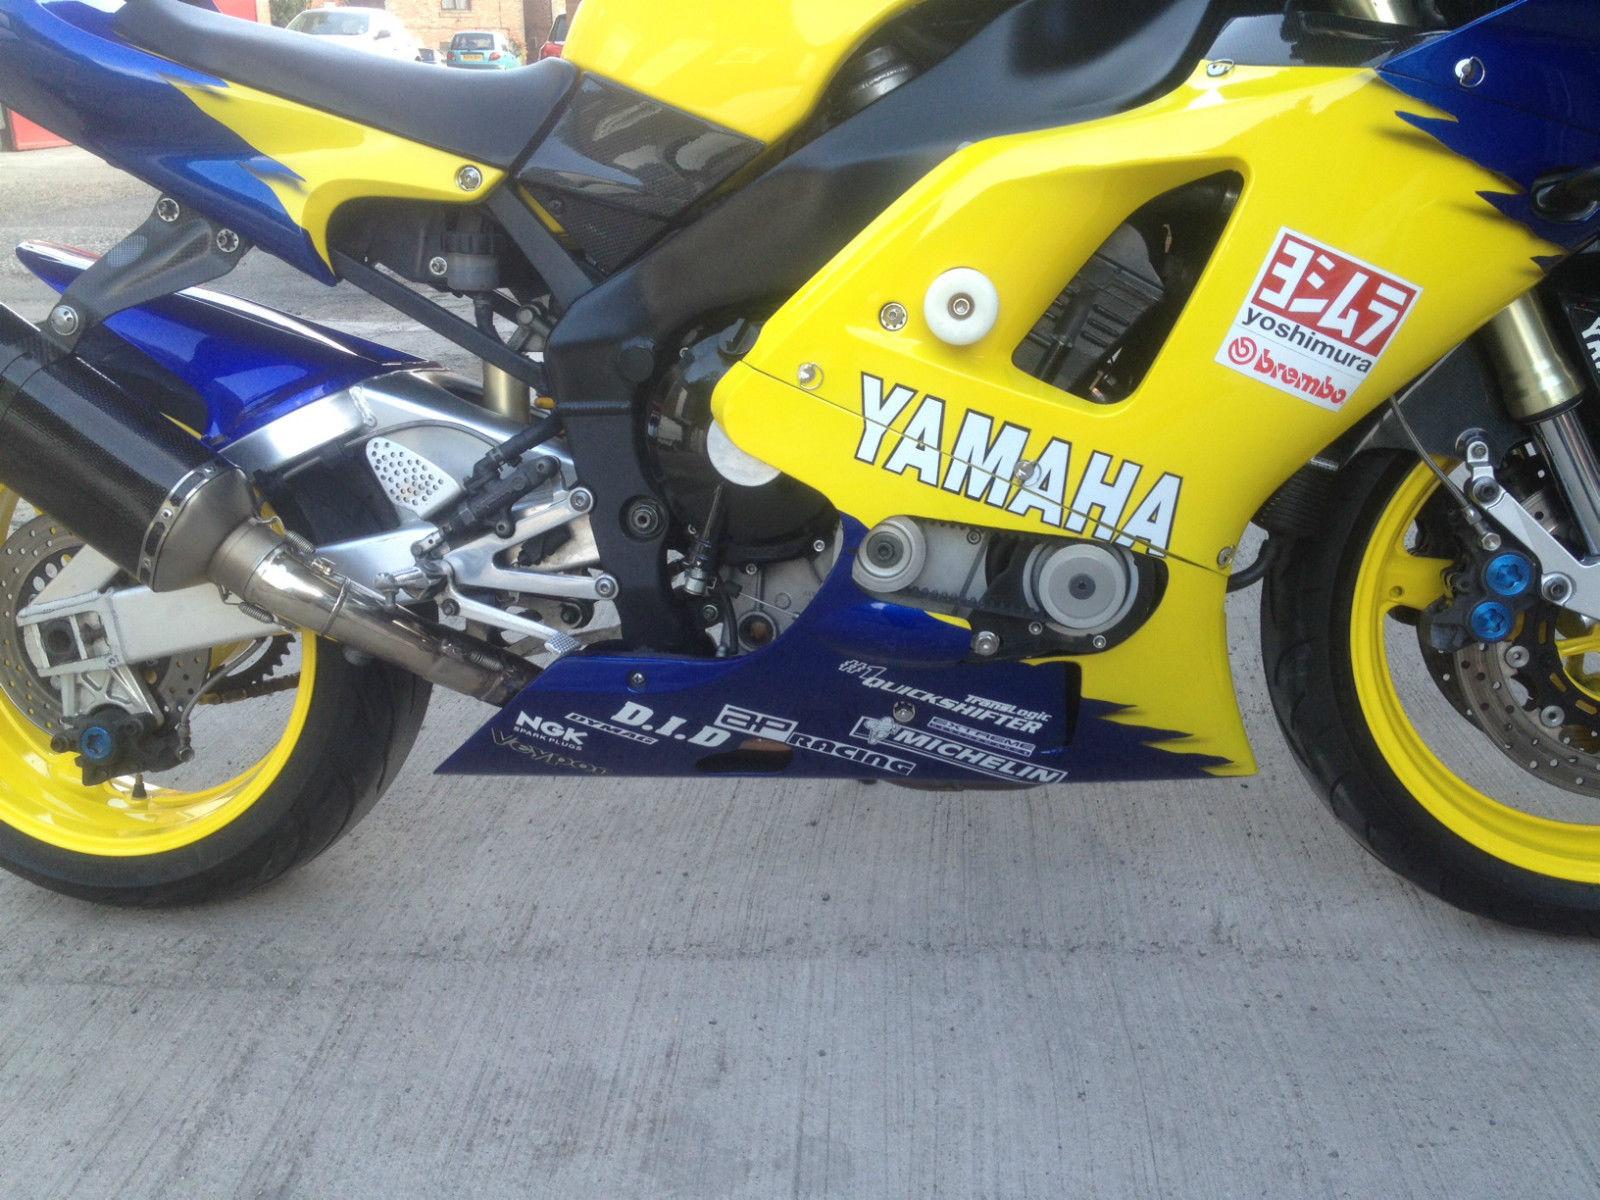 1999 Yamaha R1 Supercharged TTS Rotrex 4xv not Turbo